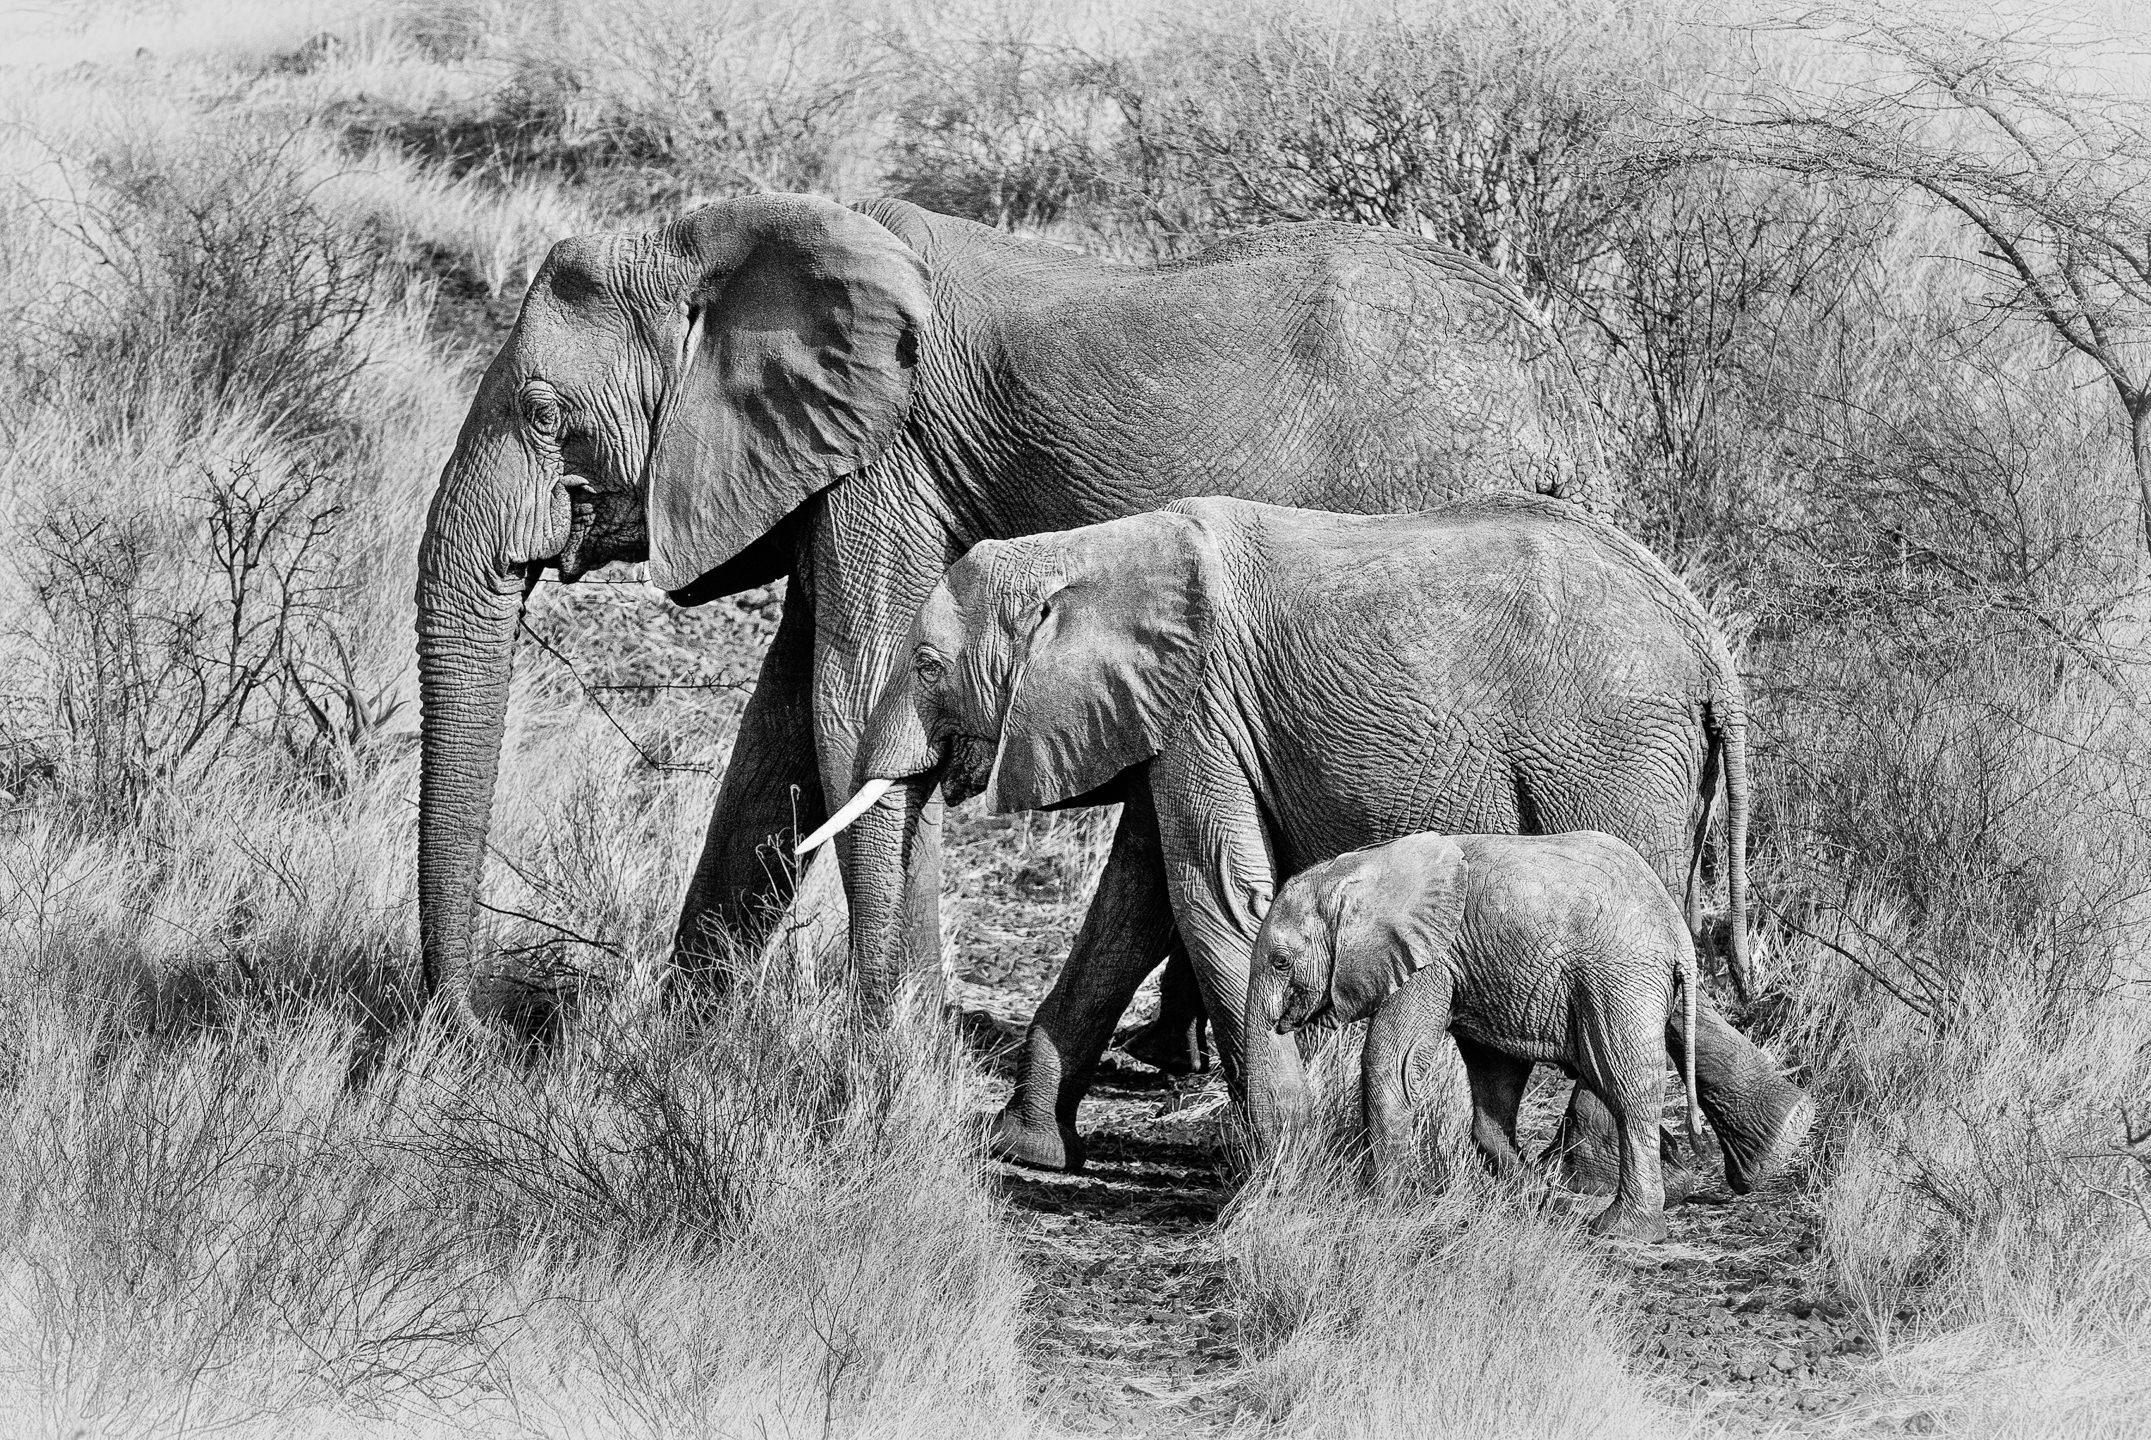 [2010-09-25]_Kenya_NIKON_D700_(00830)-Edit-2-Edit-Edit[2].jpg